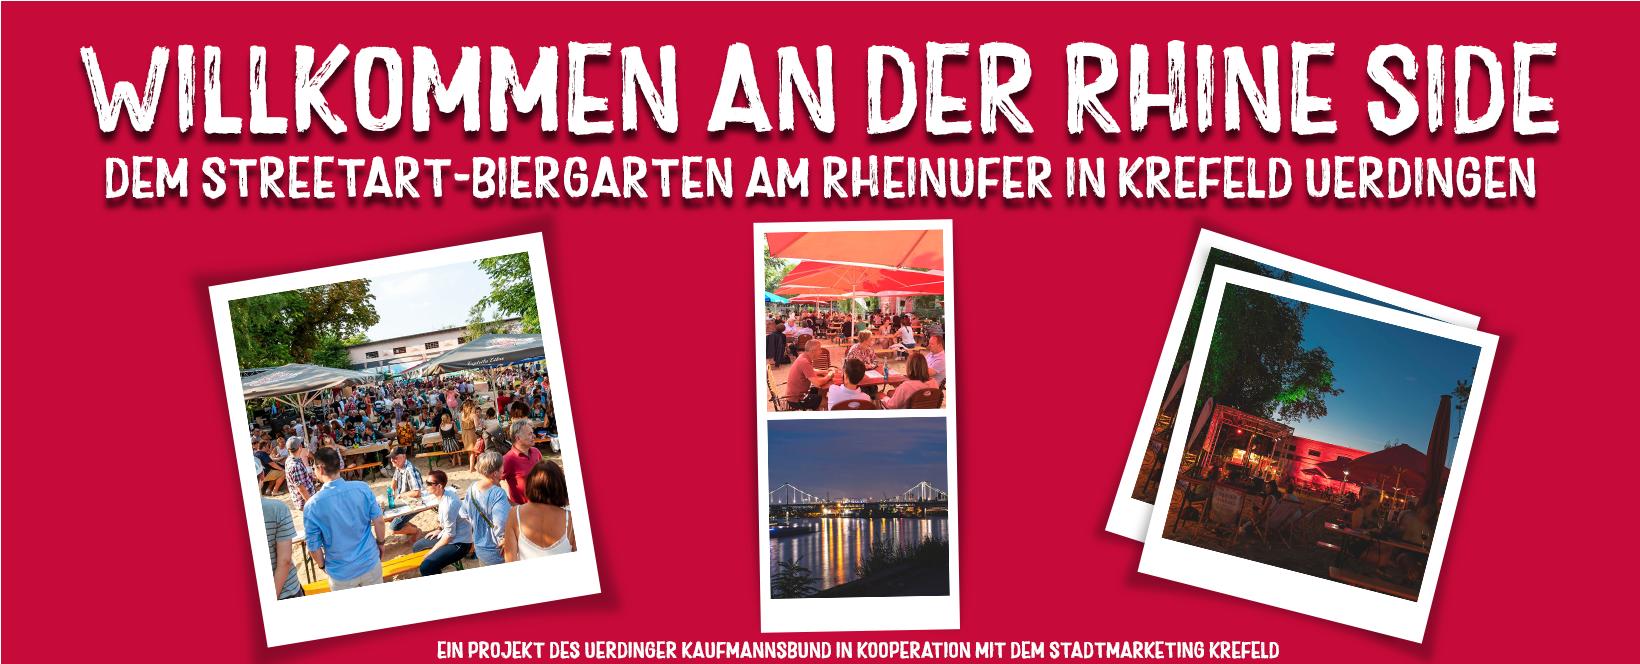 Rhine Side Regeln – Corona-Prävention -